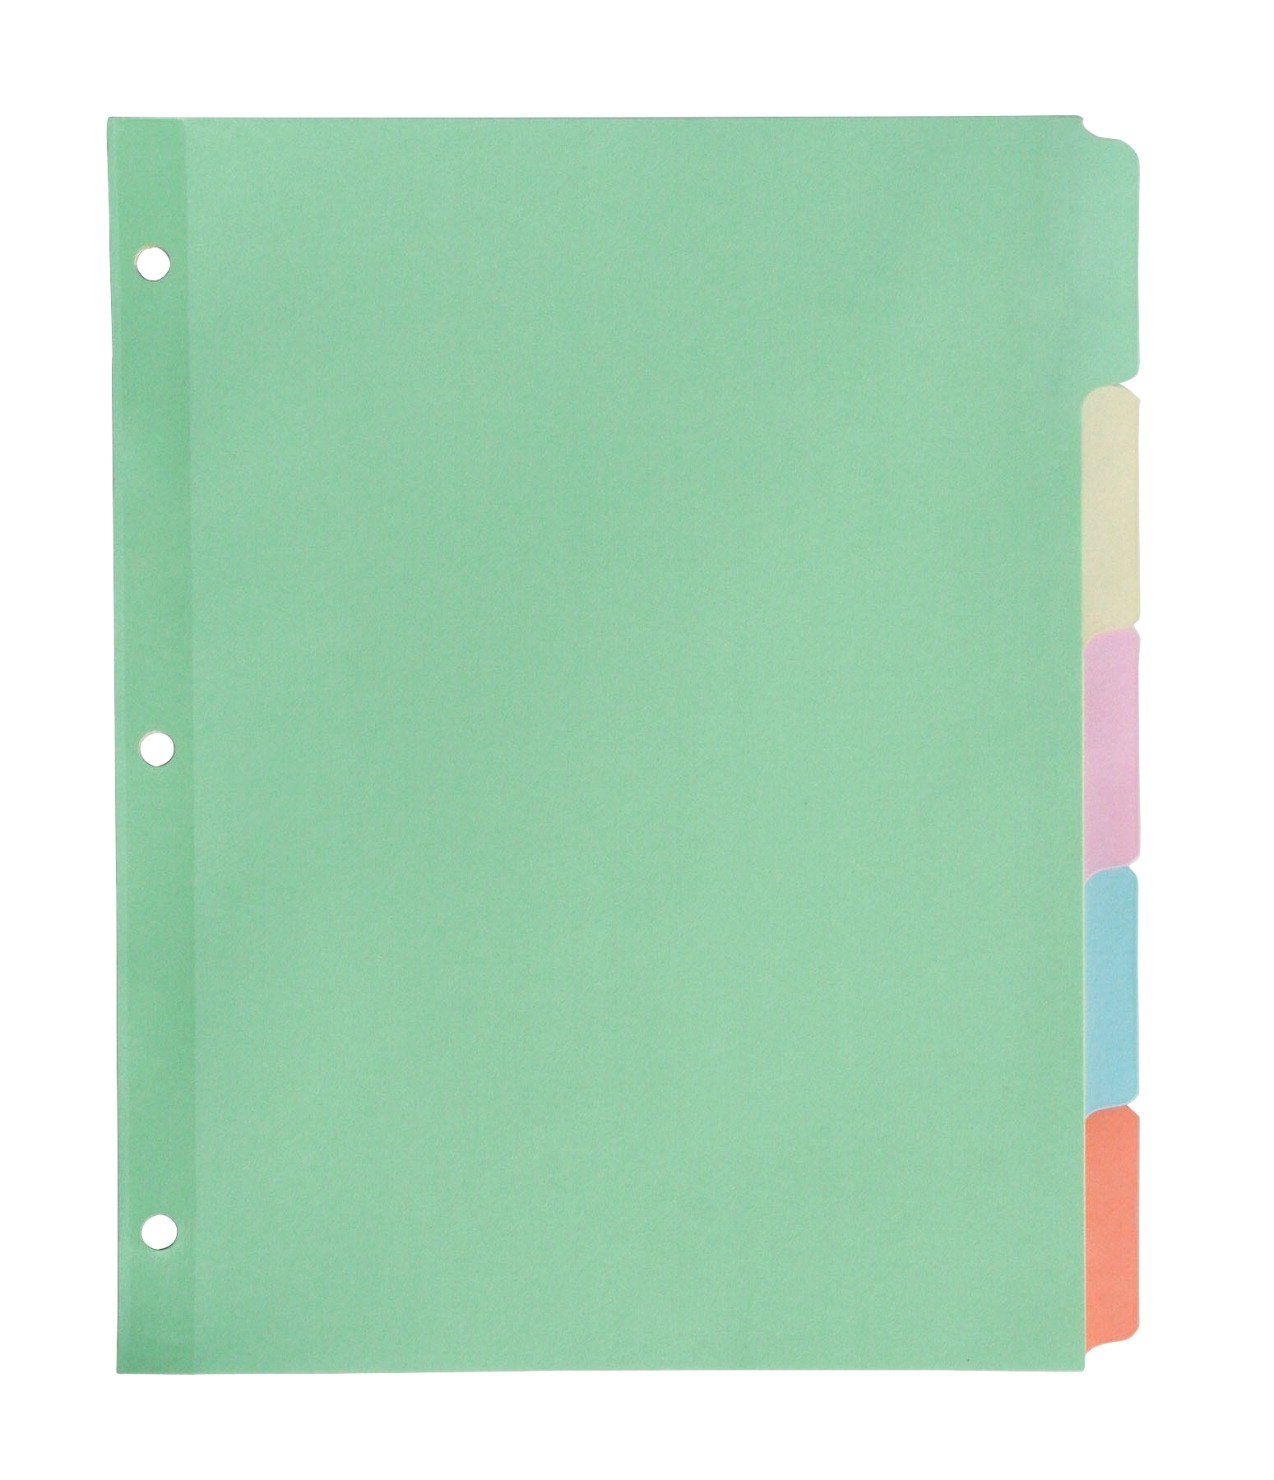 School Smart Paper Plastic Erasable Index 5-Tab, 11 x 8-1/2 Inches, Assorted Color, Set of 1